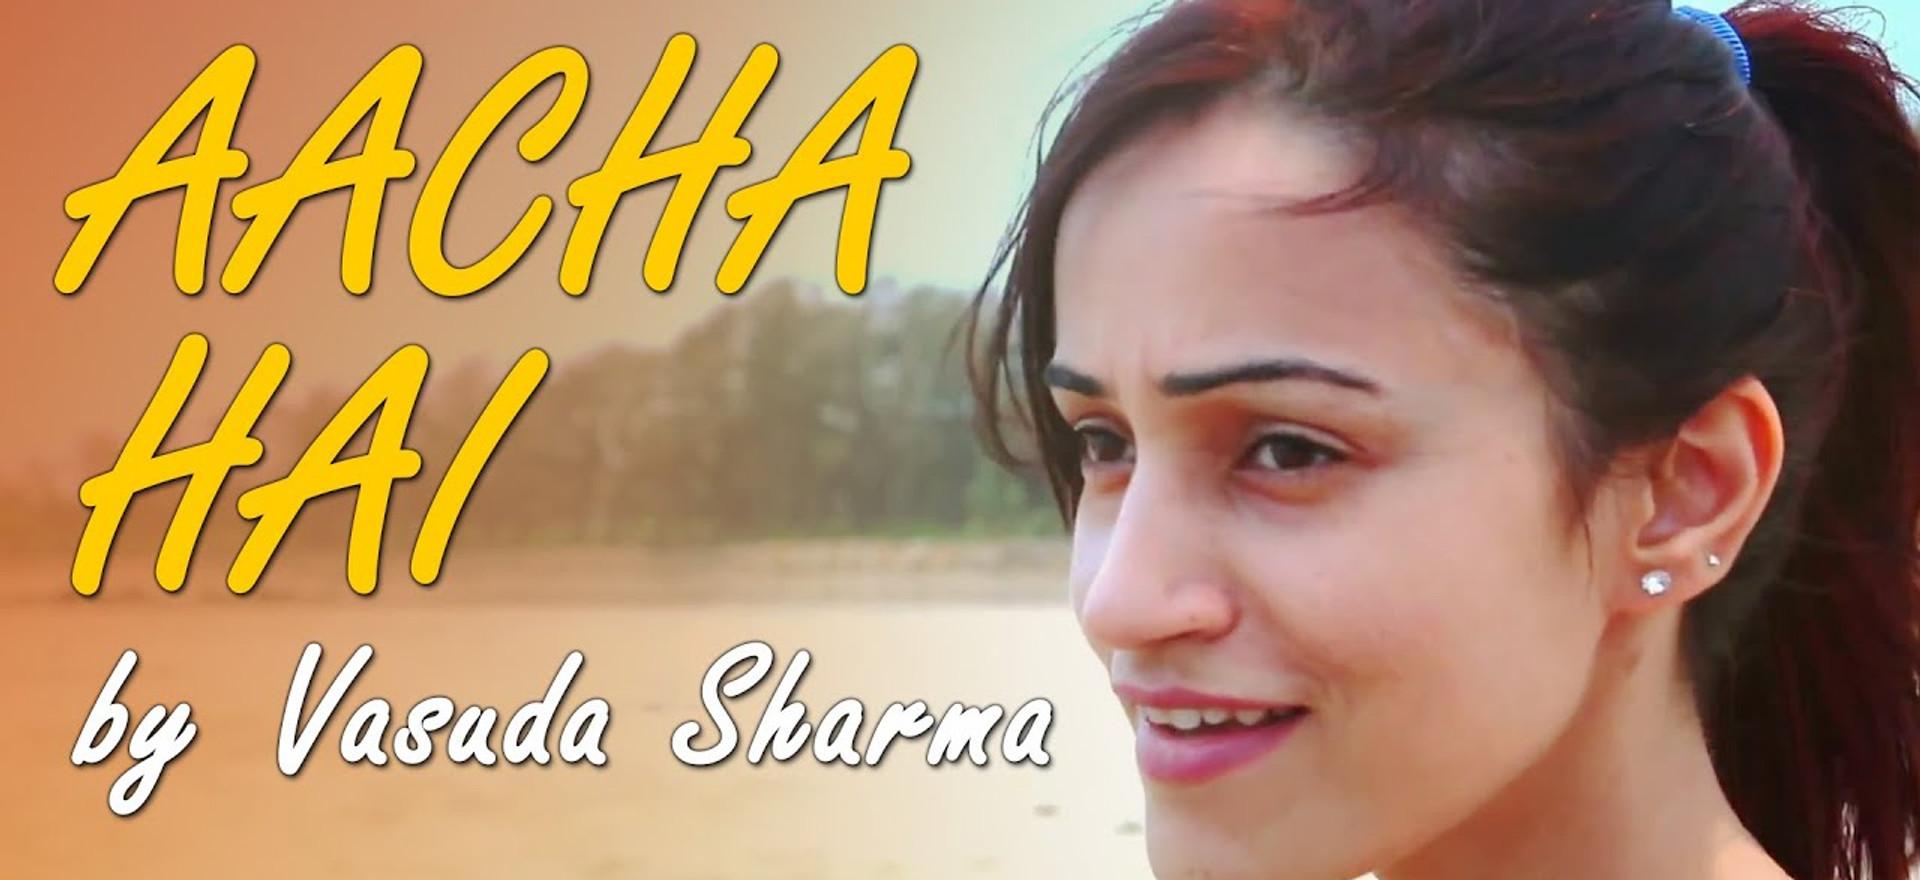 Achcha Hai - Original by Vasuda Sharma